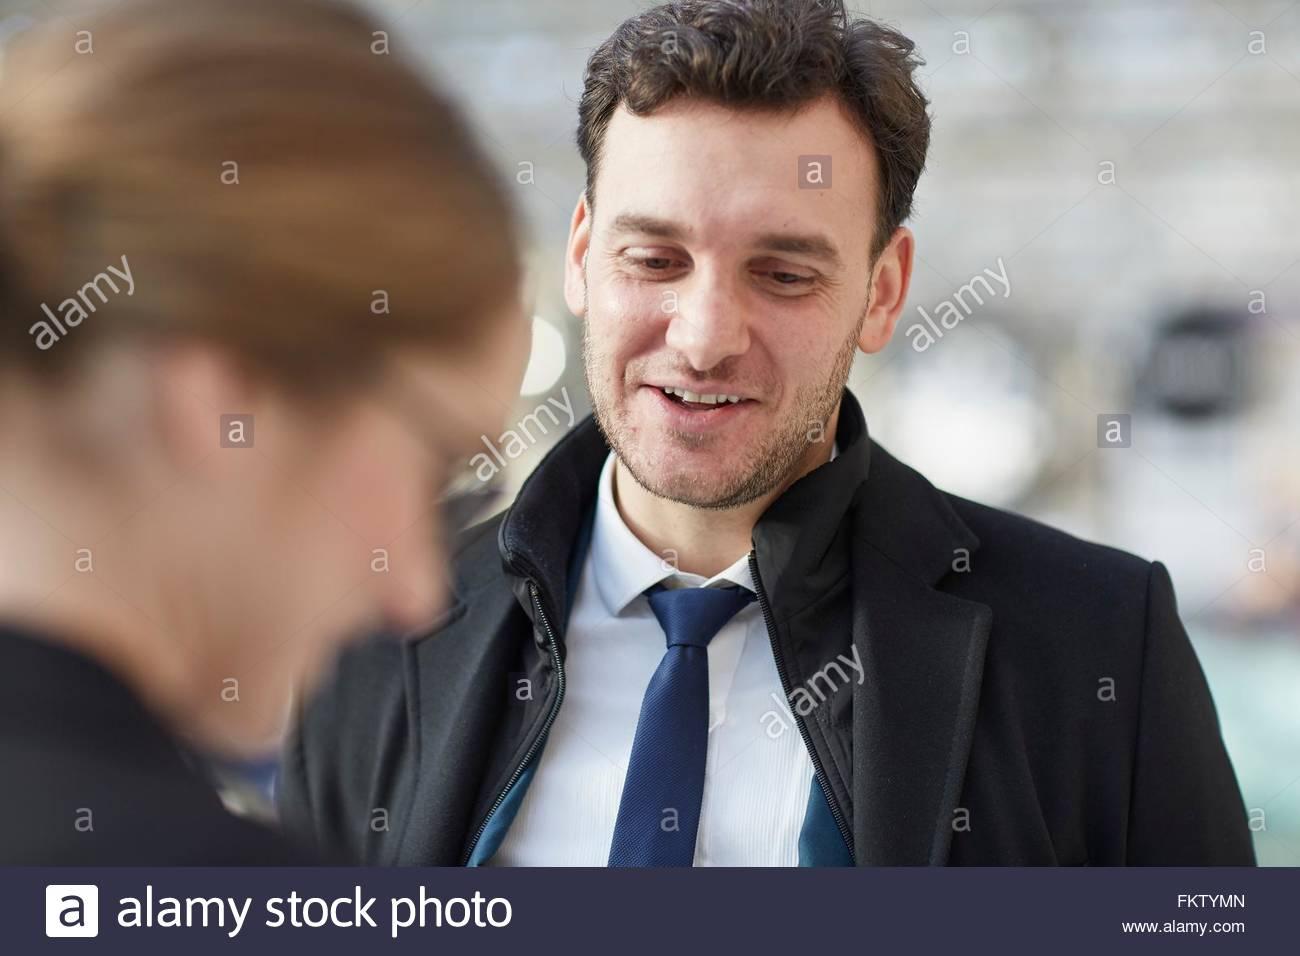 Business man parlando a un collega guardando giù sorridente Immagini Stock